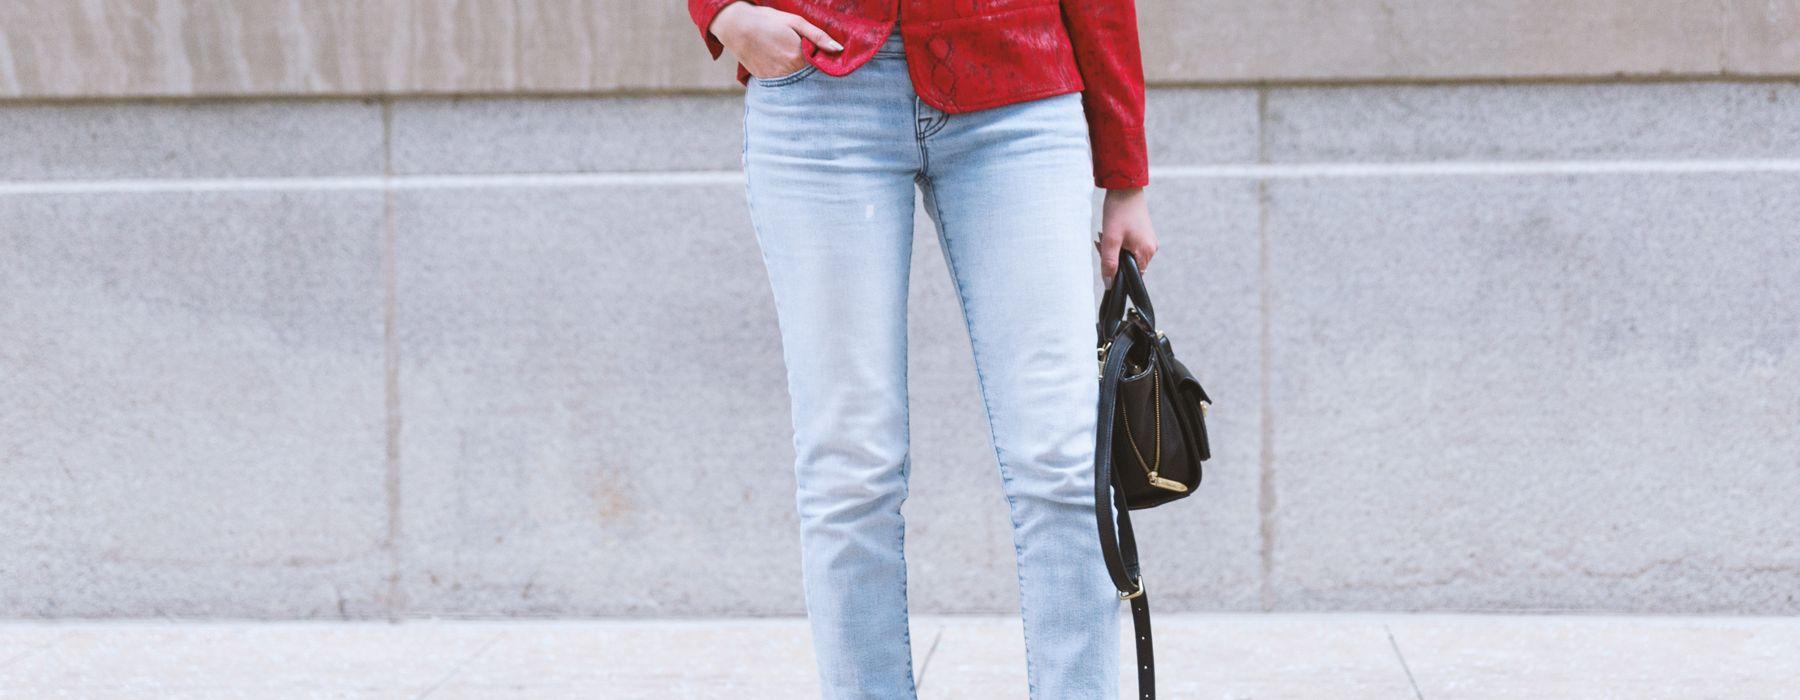 Come indossare i jeans skinny questa primavera